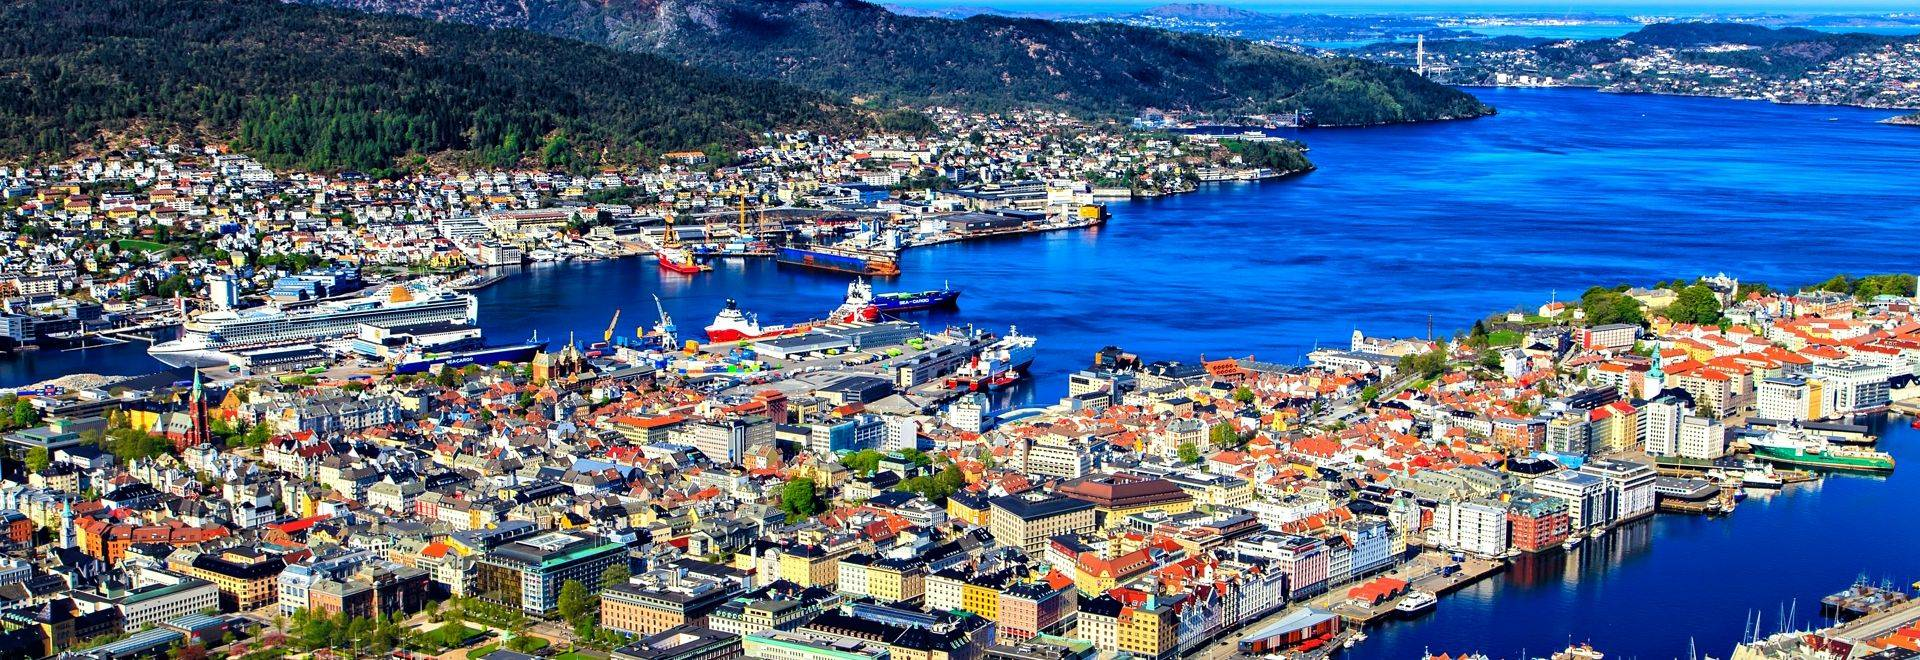 Shutterstock 228665431 Bergen